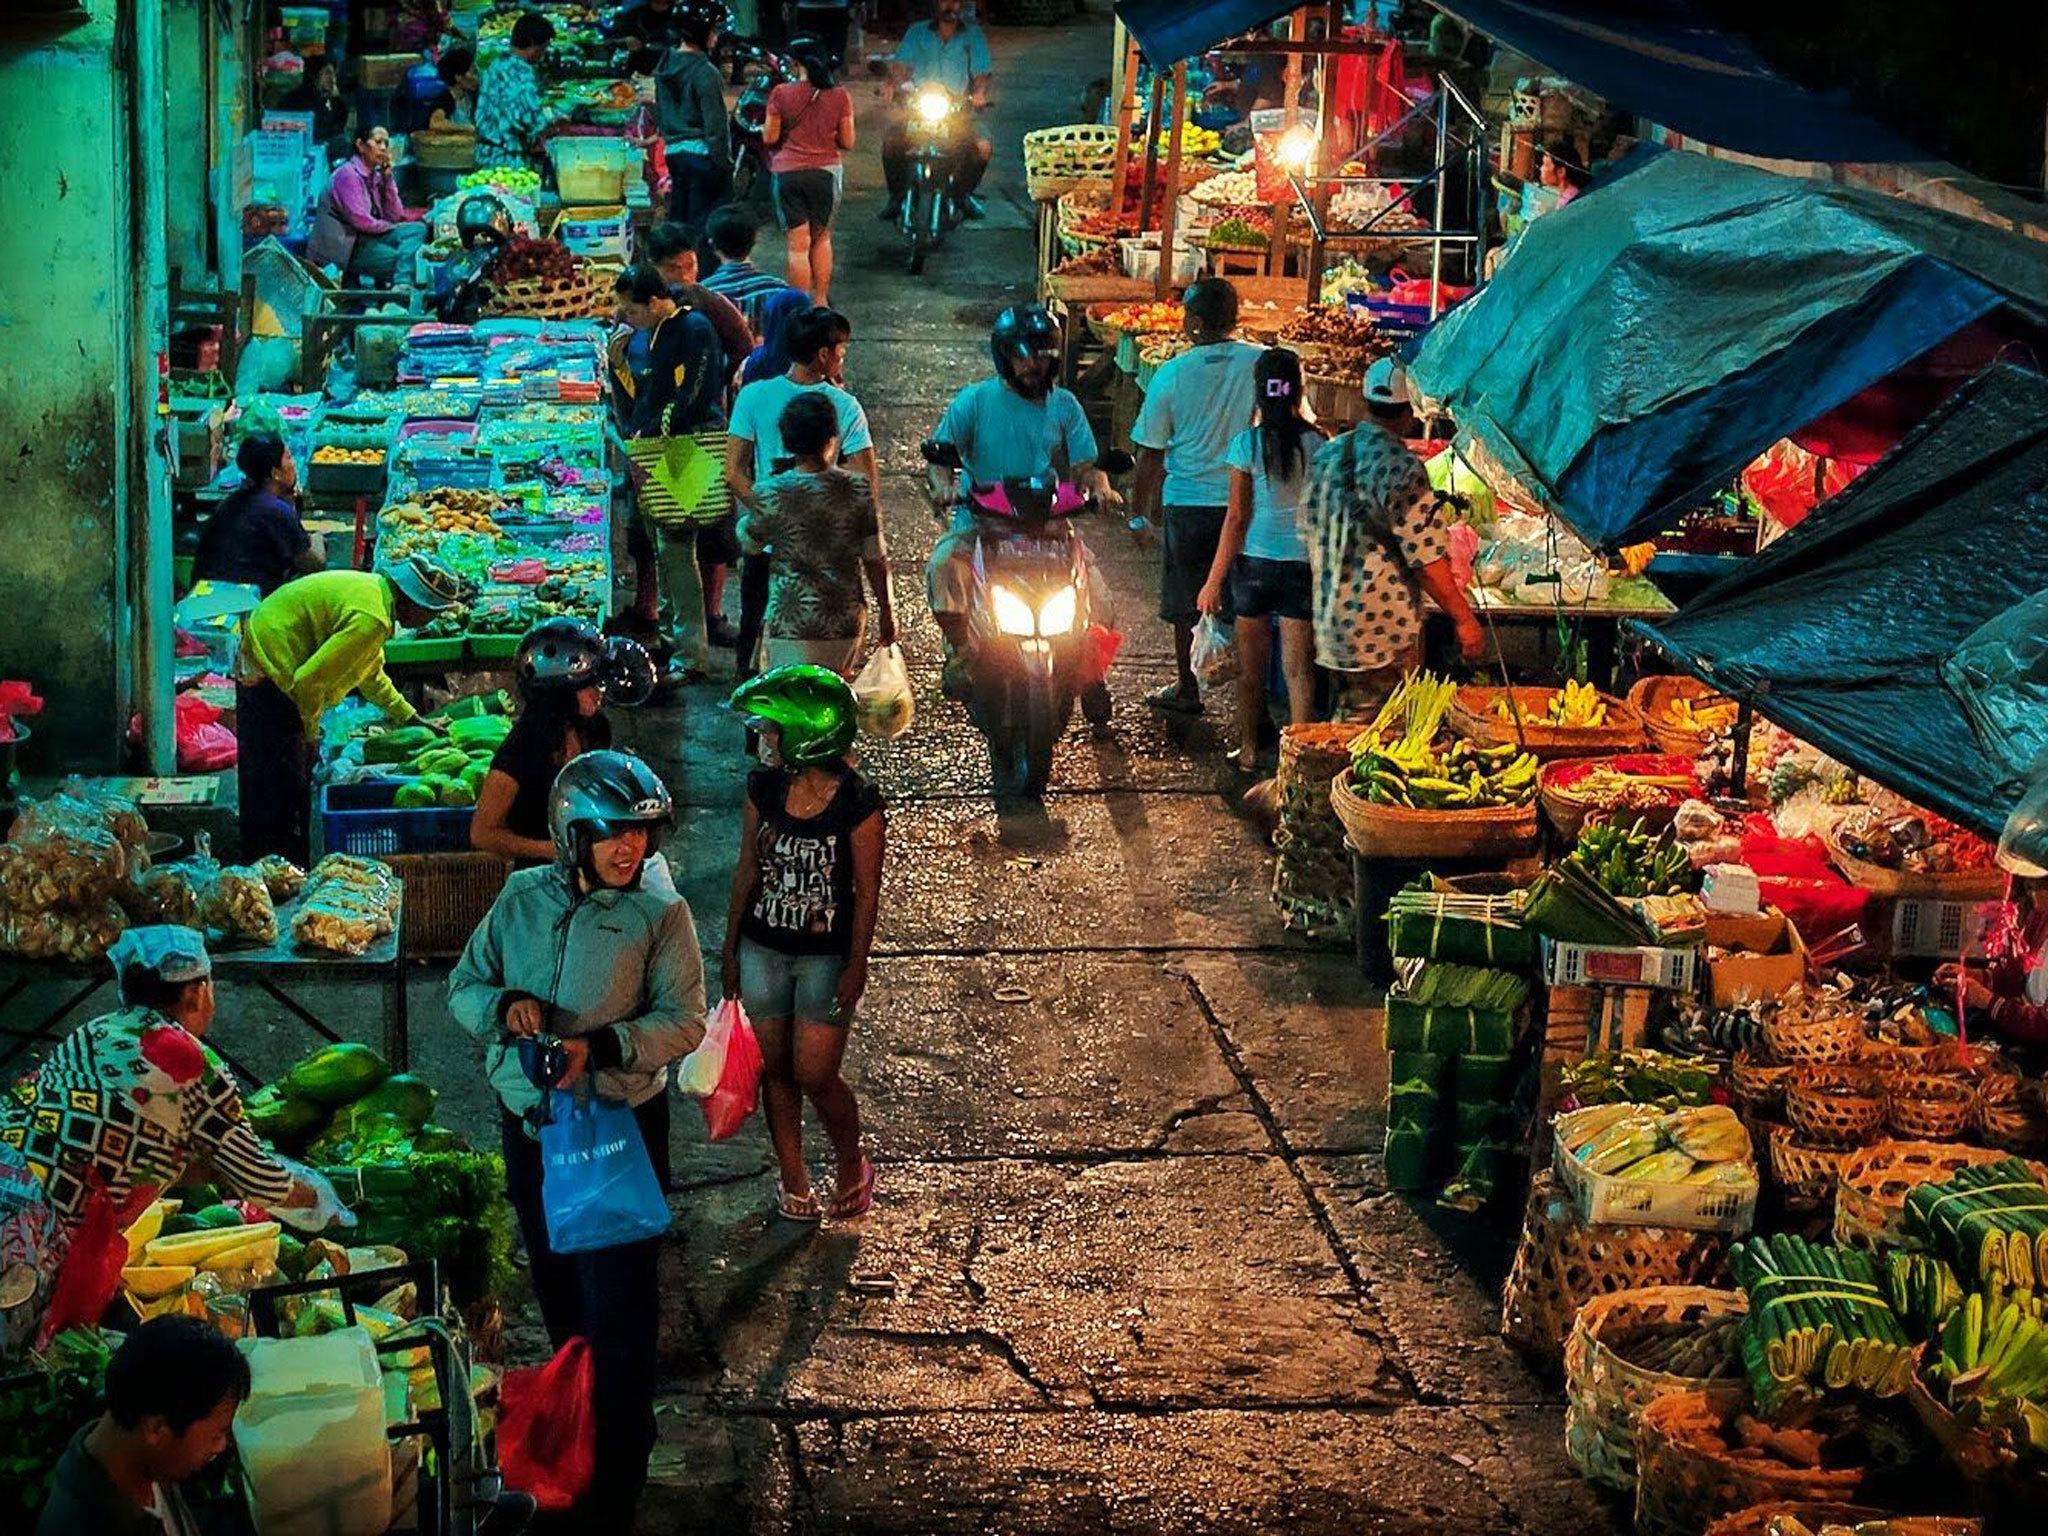 Seminyak Night Market - Indonesia